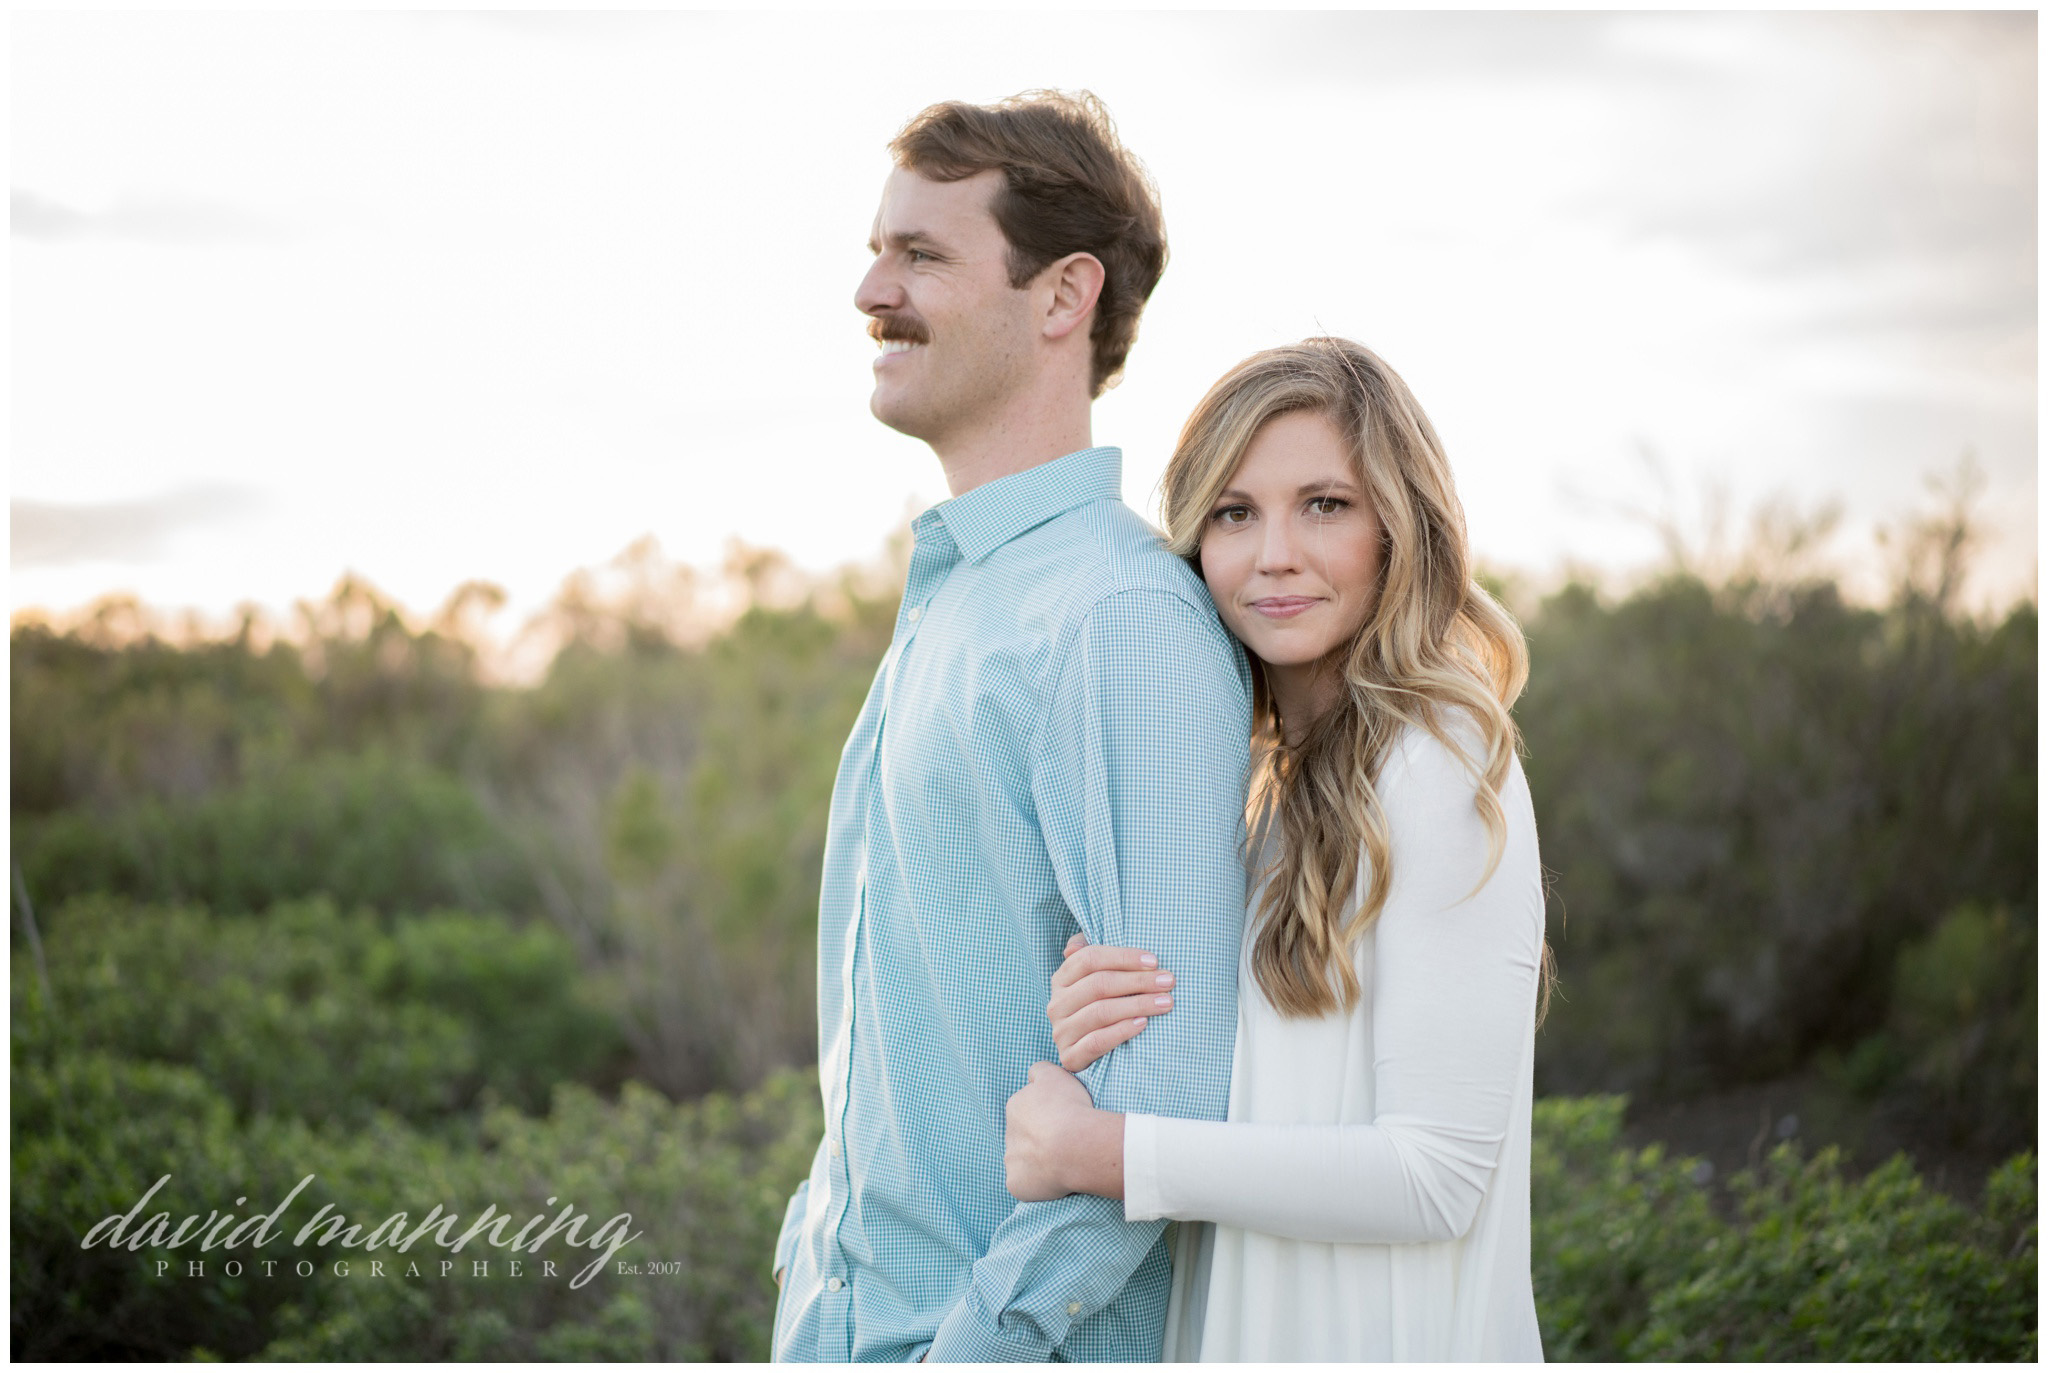 Alyssa-Taylor-Engagement-David-Manning-Photographer-0121.JPG